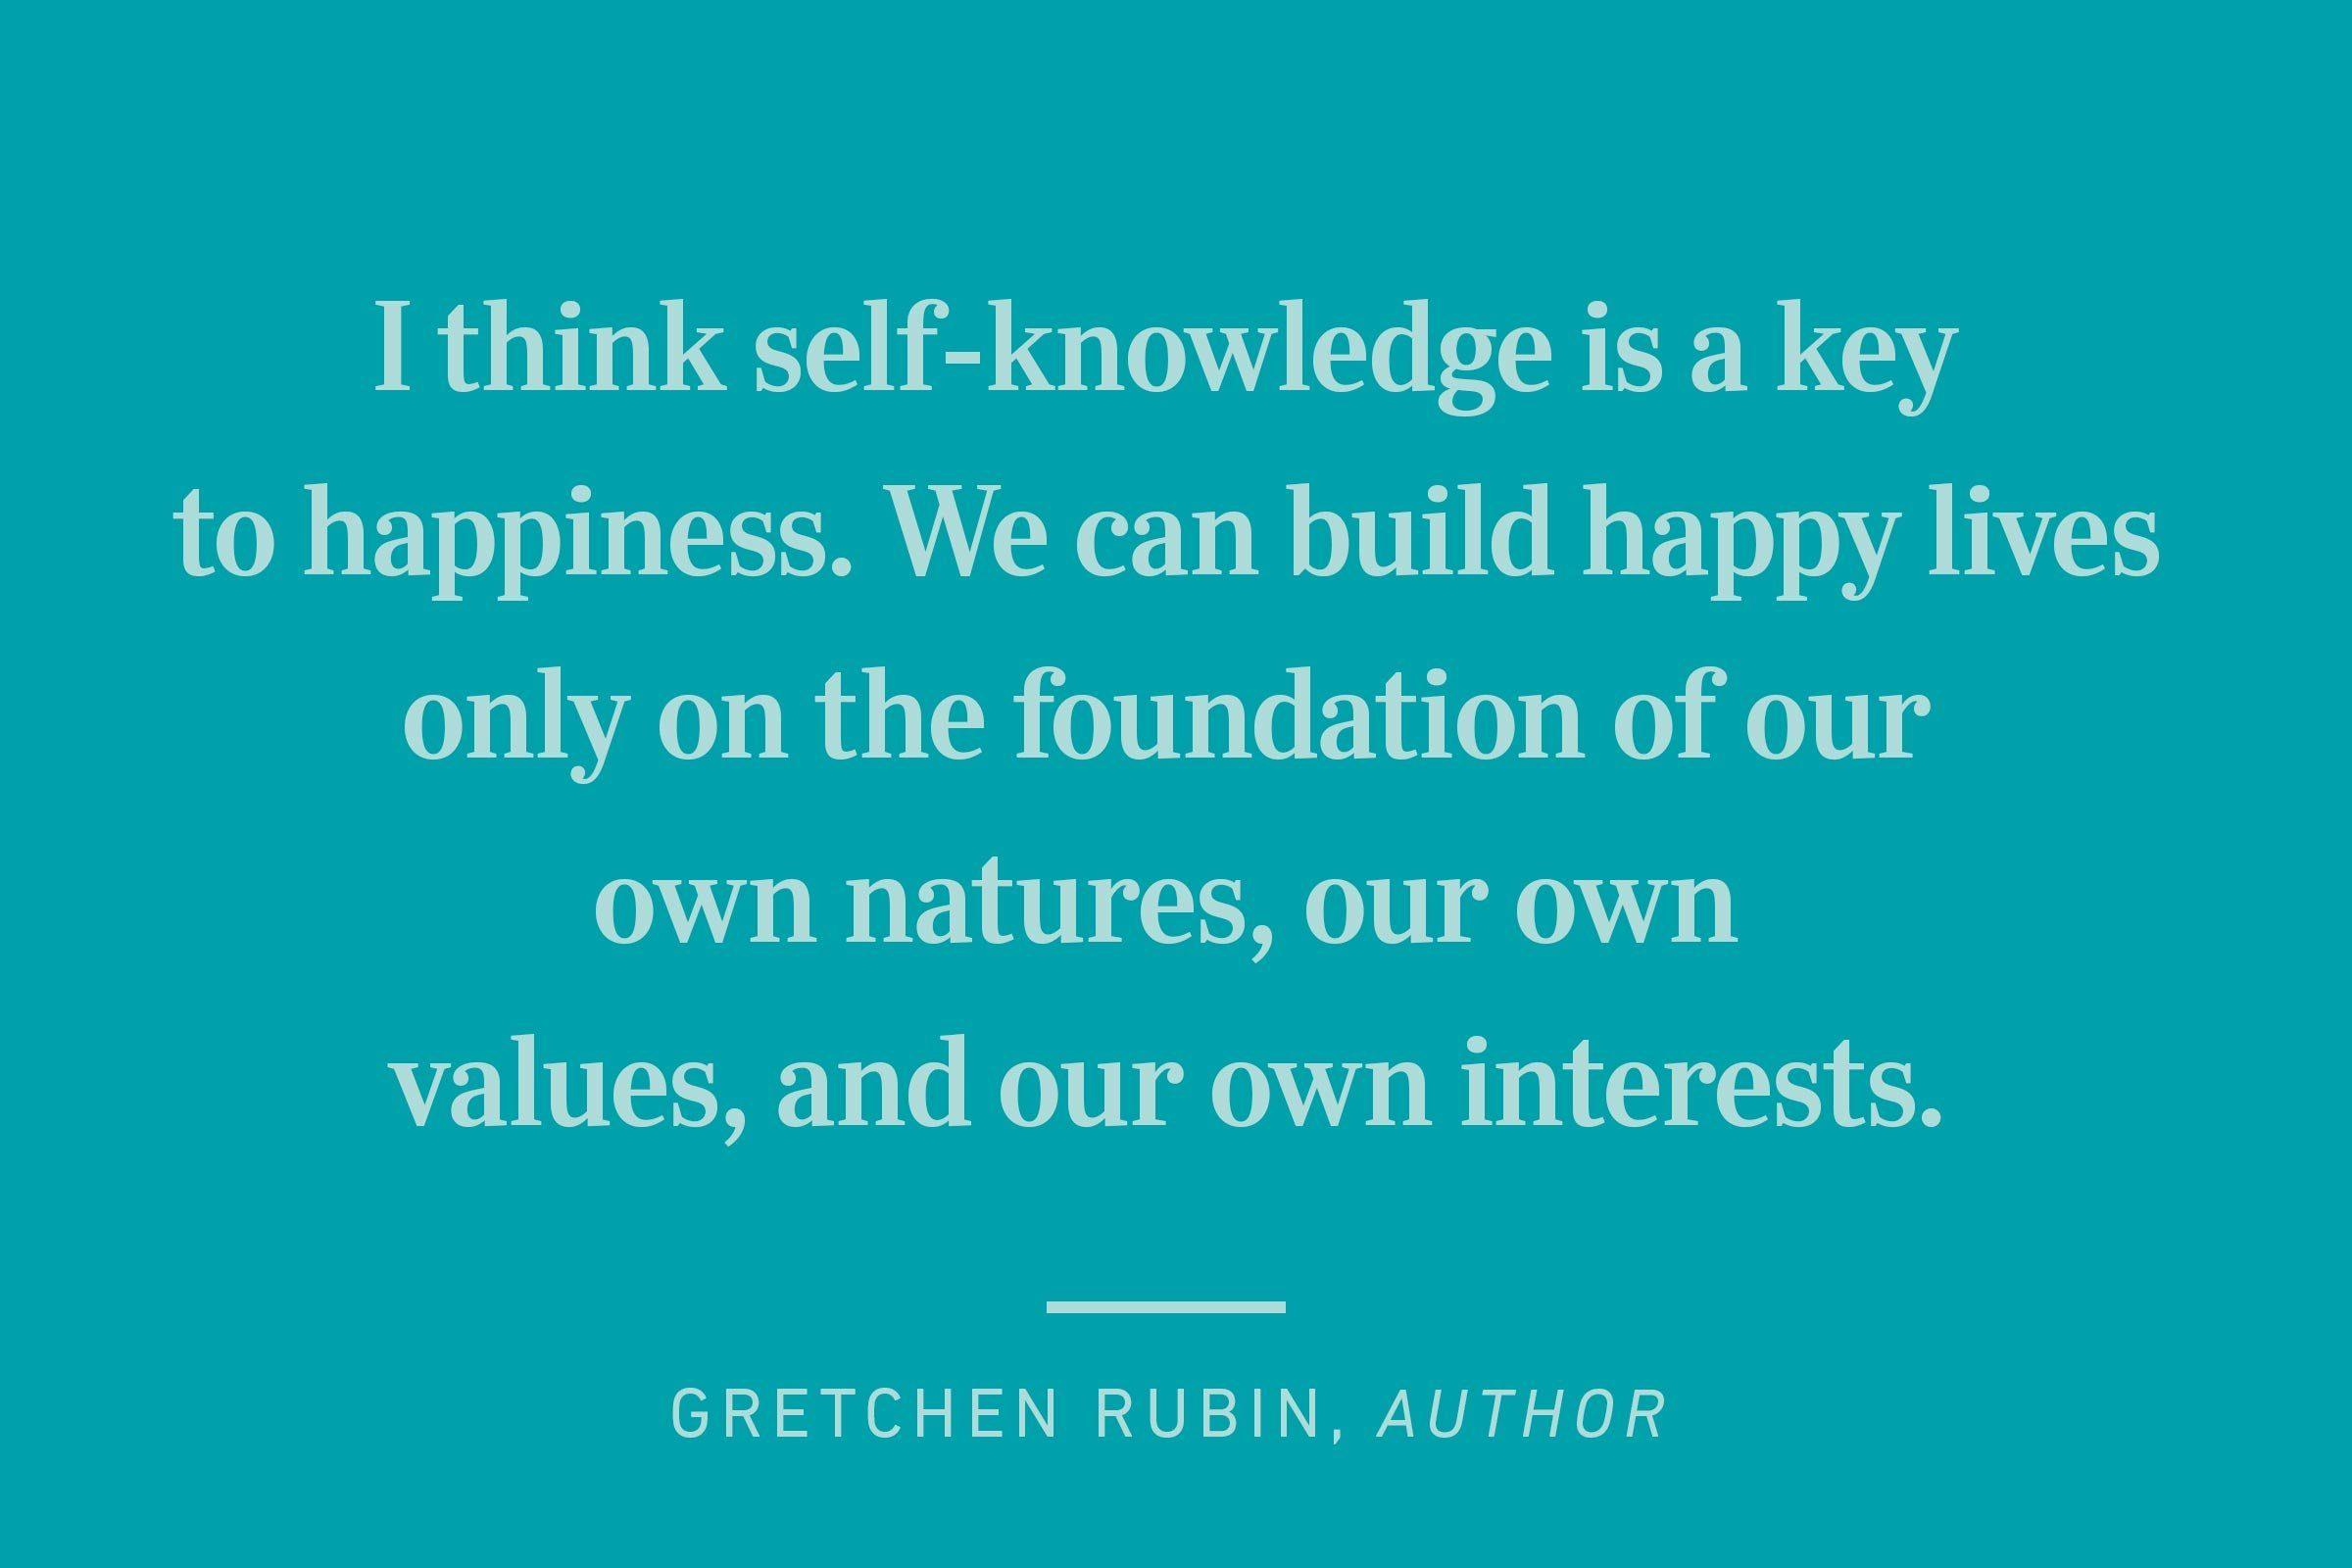 gretchen rubin happiness quote